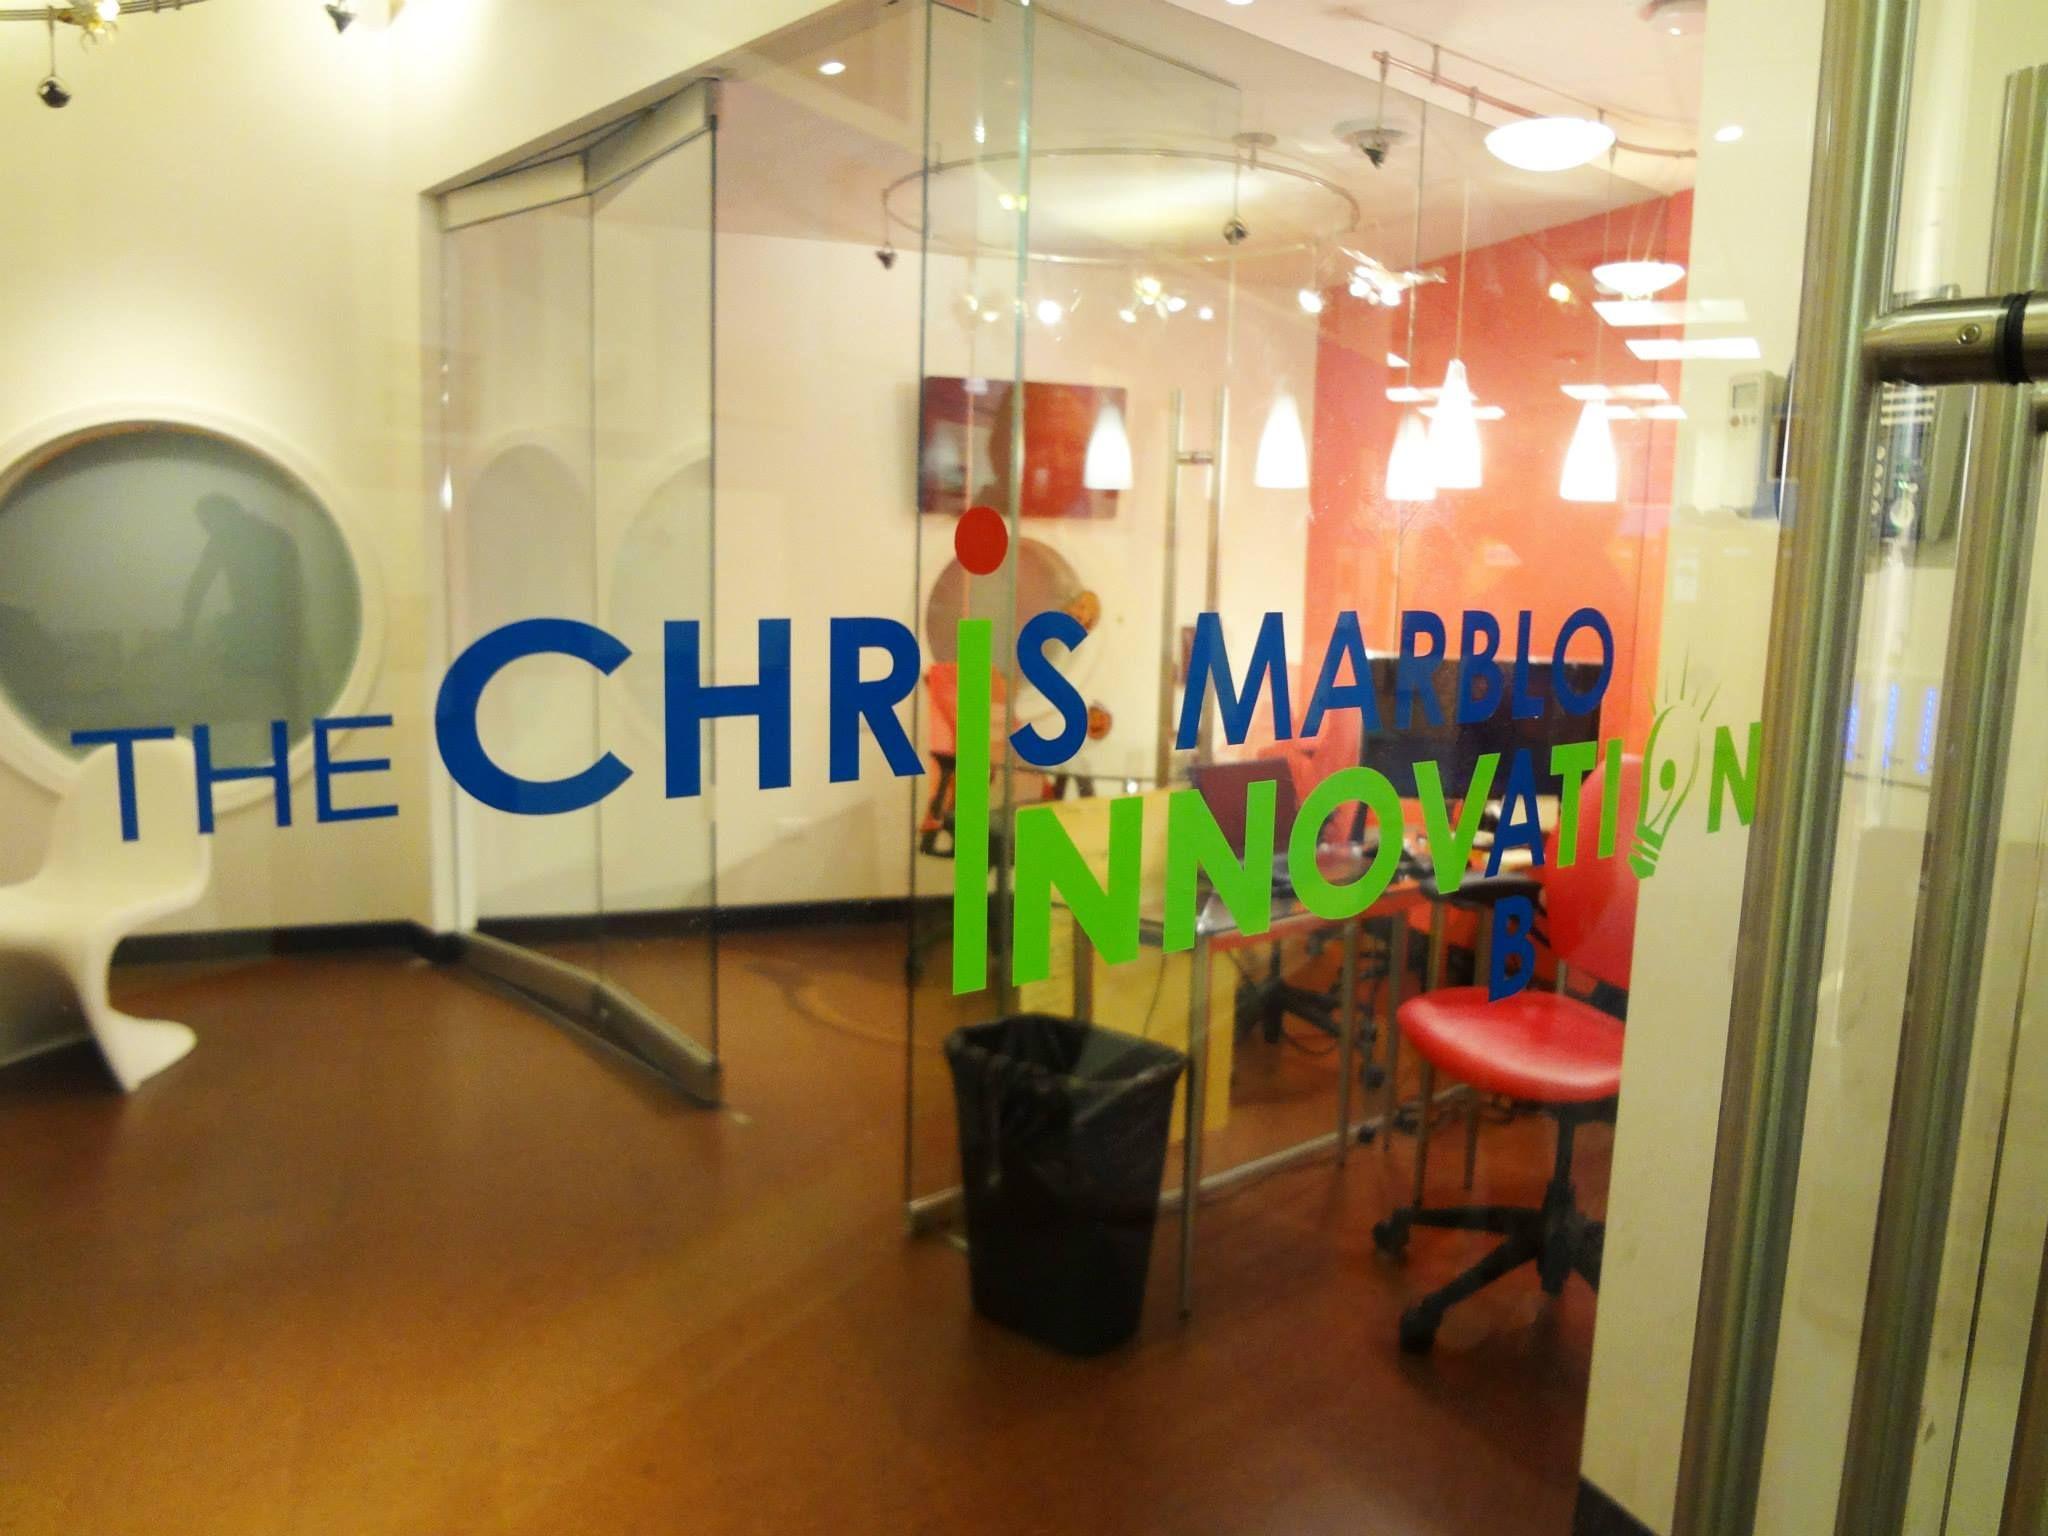 Custom 3 Color Die Cut Adhesive Viny Logo Applied Onto Glass Door In NYC